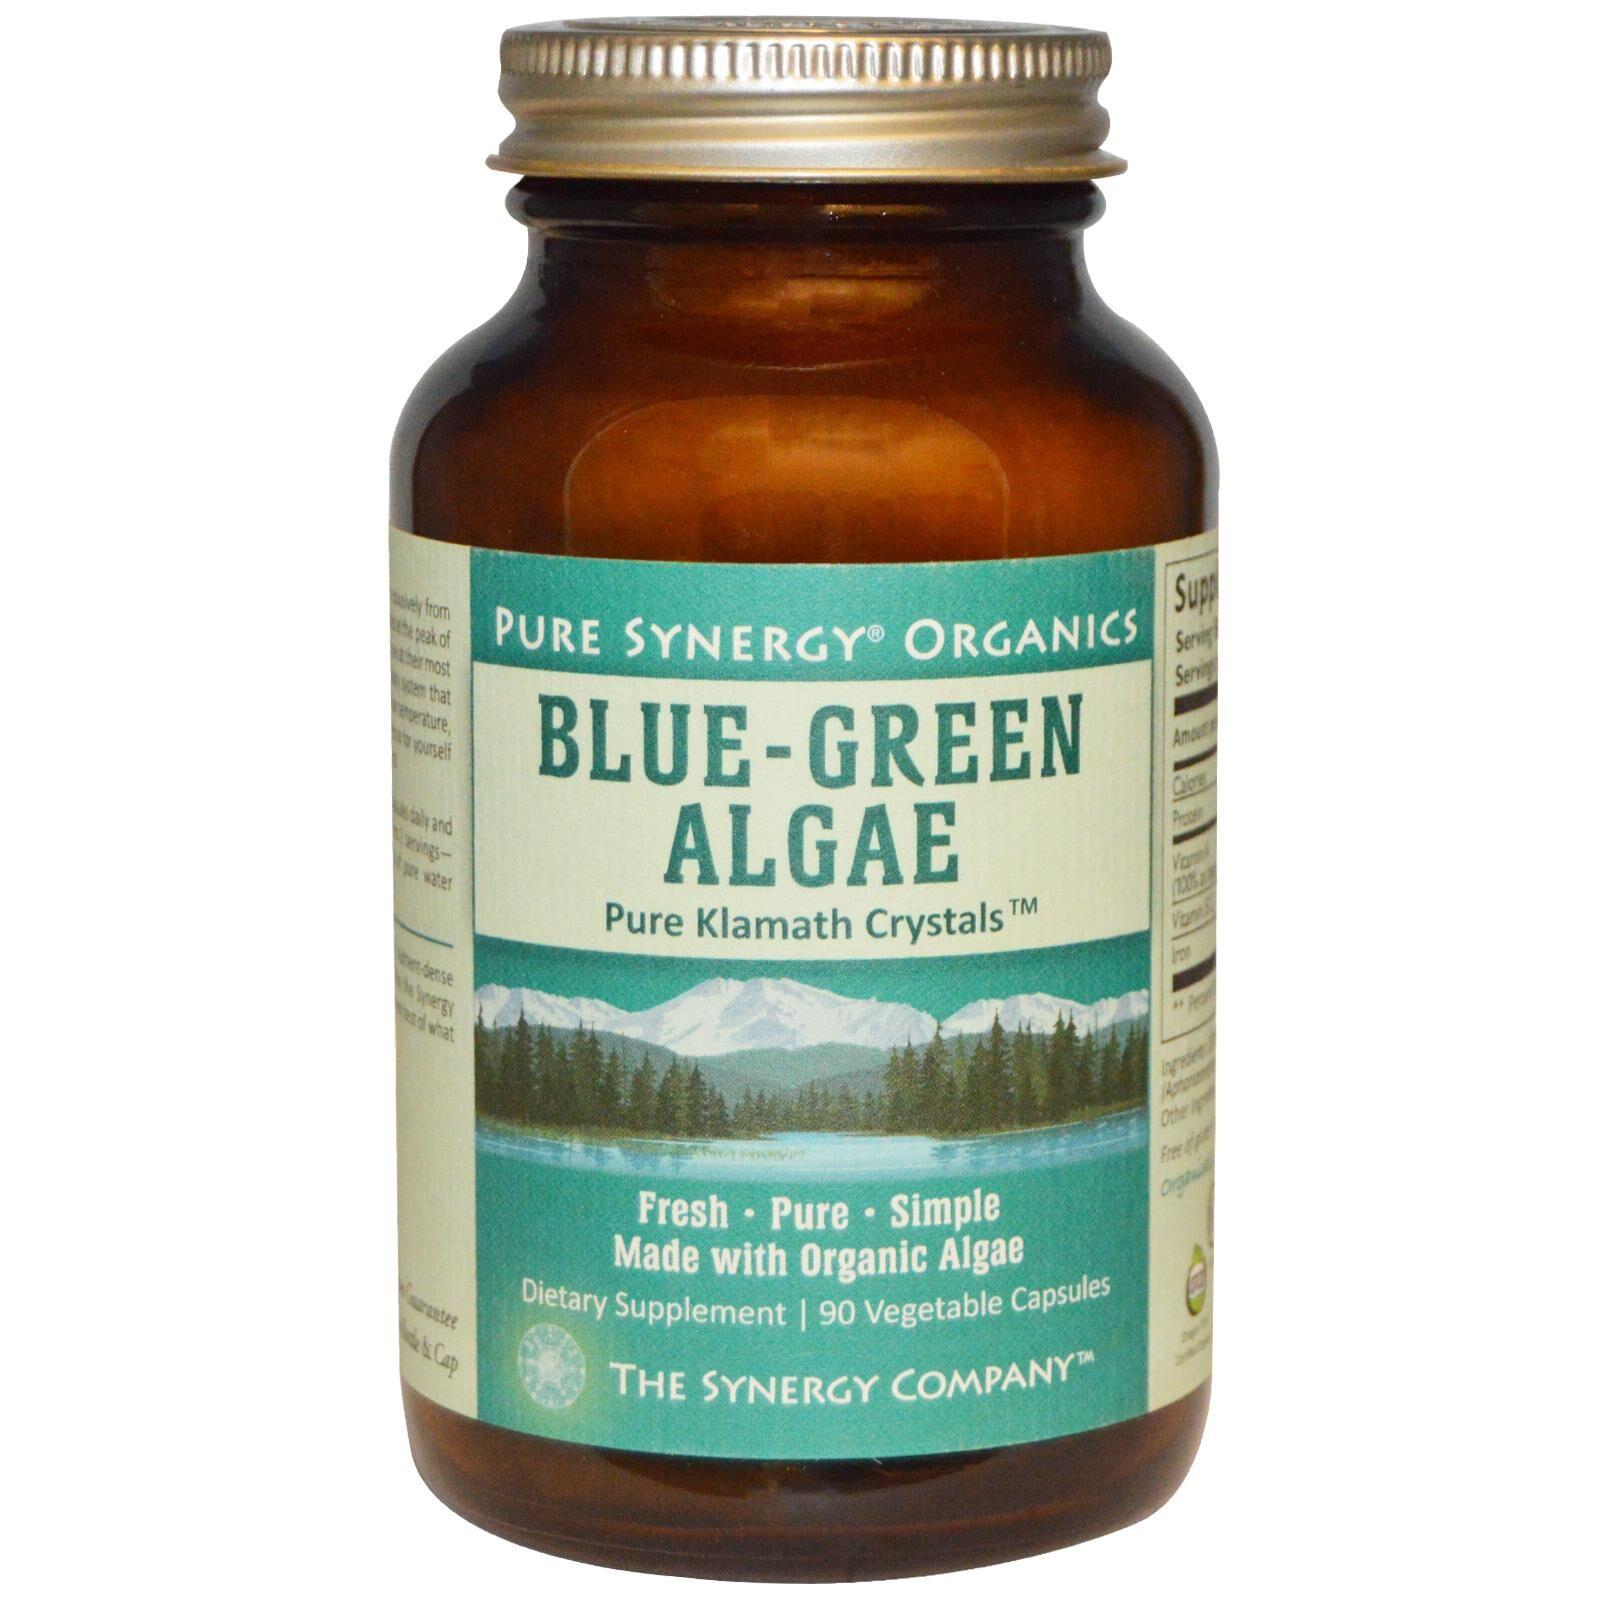 Synergy Company The Synergy Company, Bio algues bleu-vert, 90 Caps Veggie